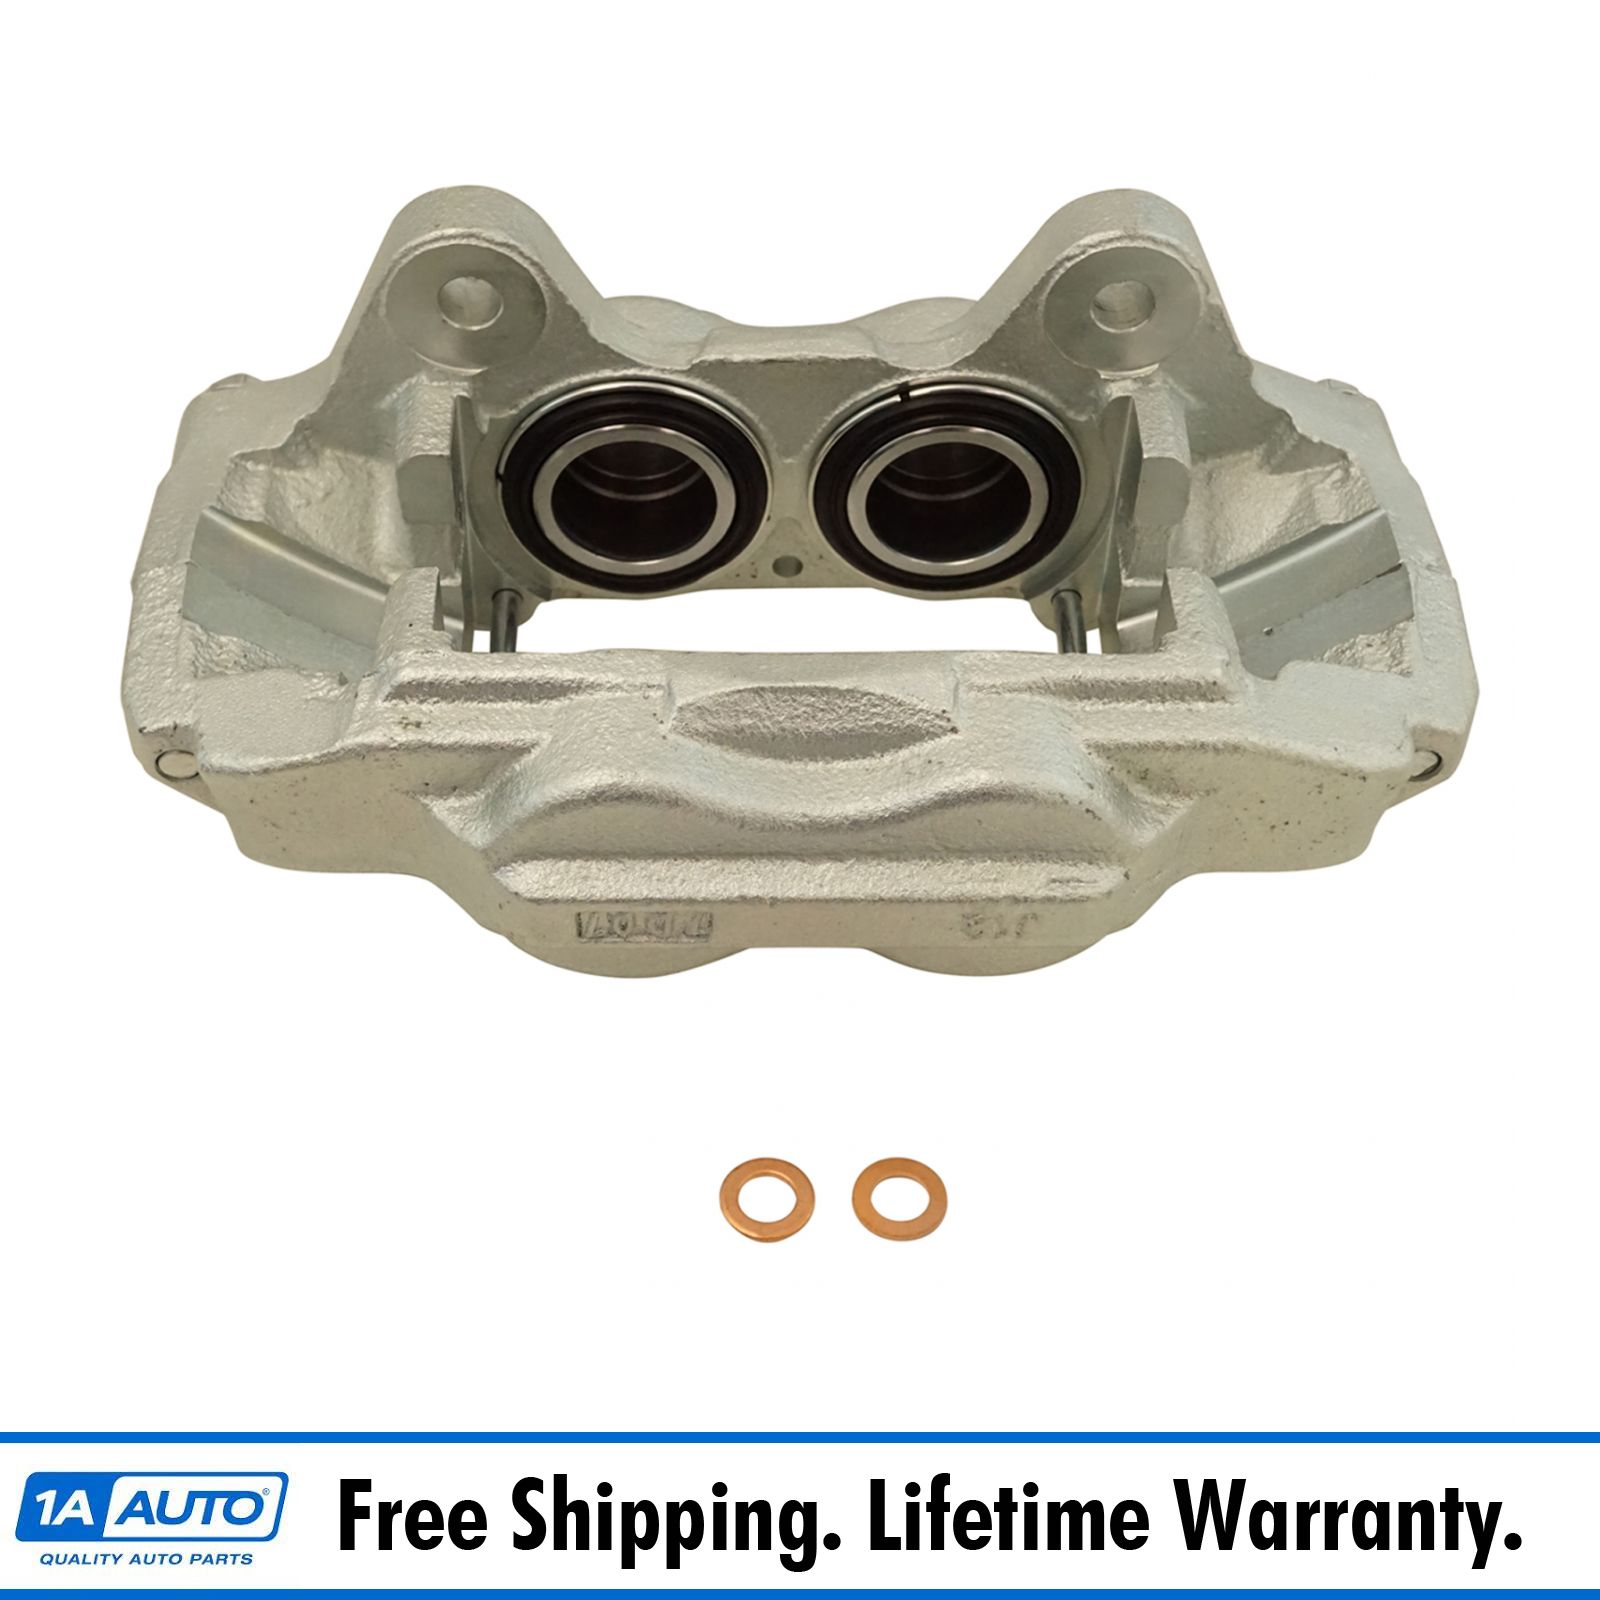 Raybestos FRC11550N Opti-Cal New Brake Caliper